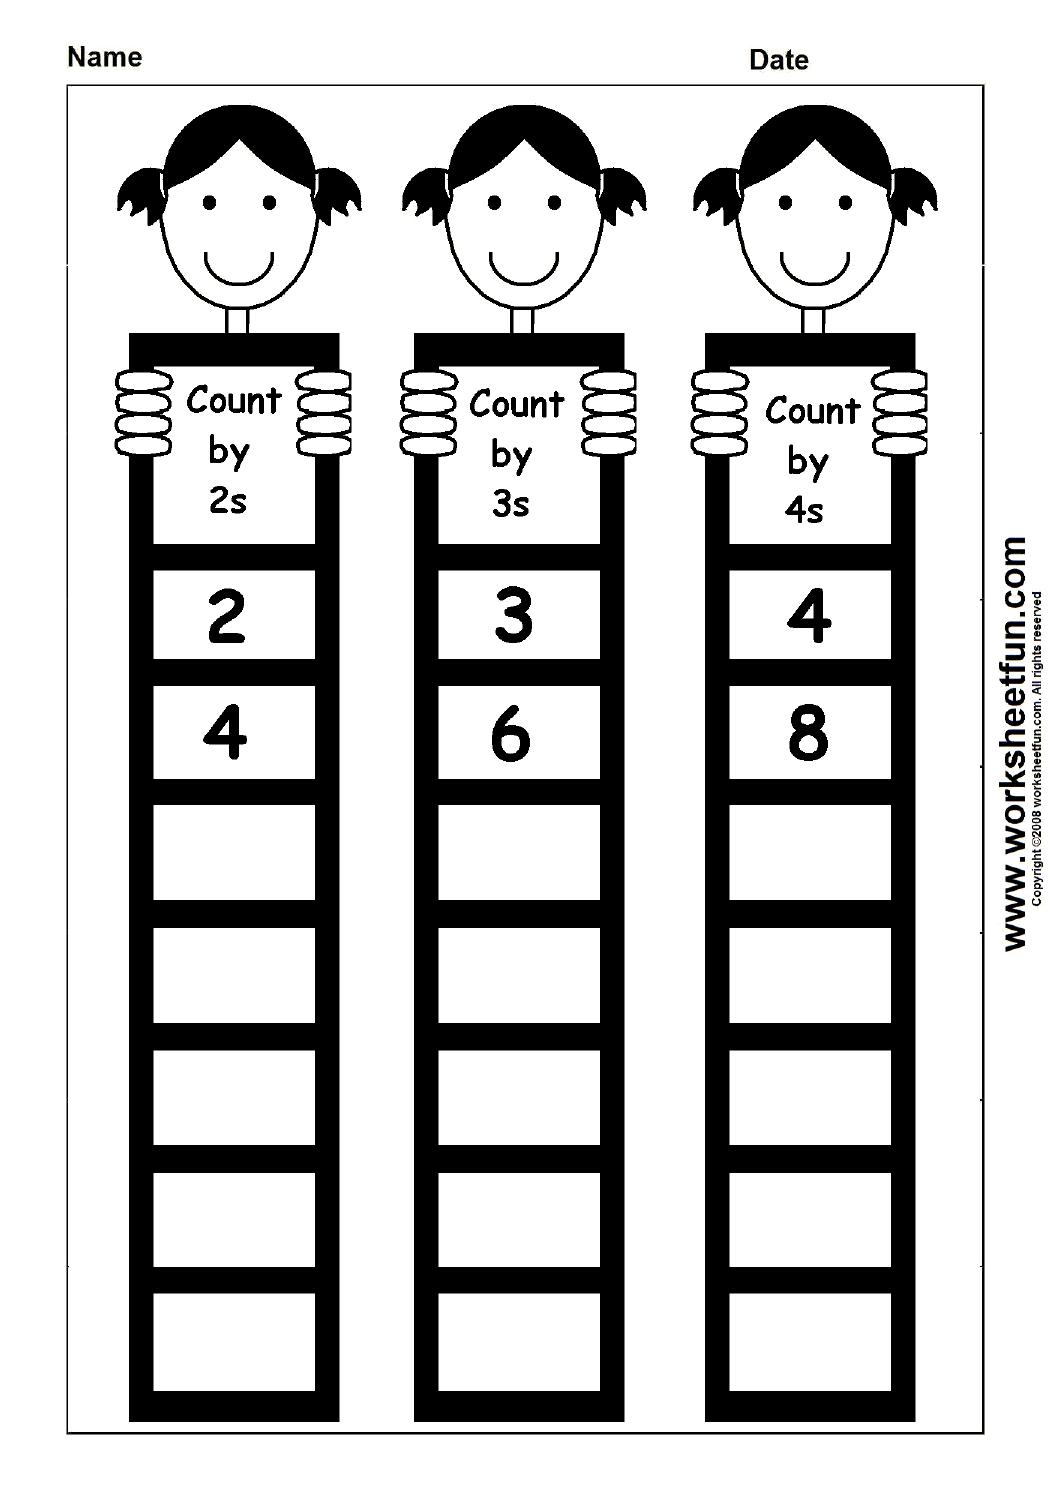 skip counting by 2 3 and 4 1 worksheet printable worksheets pinterest skip counting. Black Bedroom Furniture Sets. Home Design Ideas